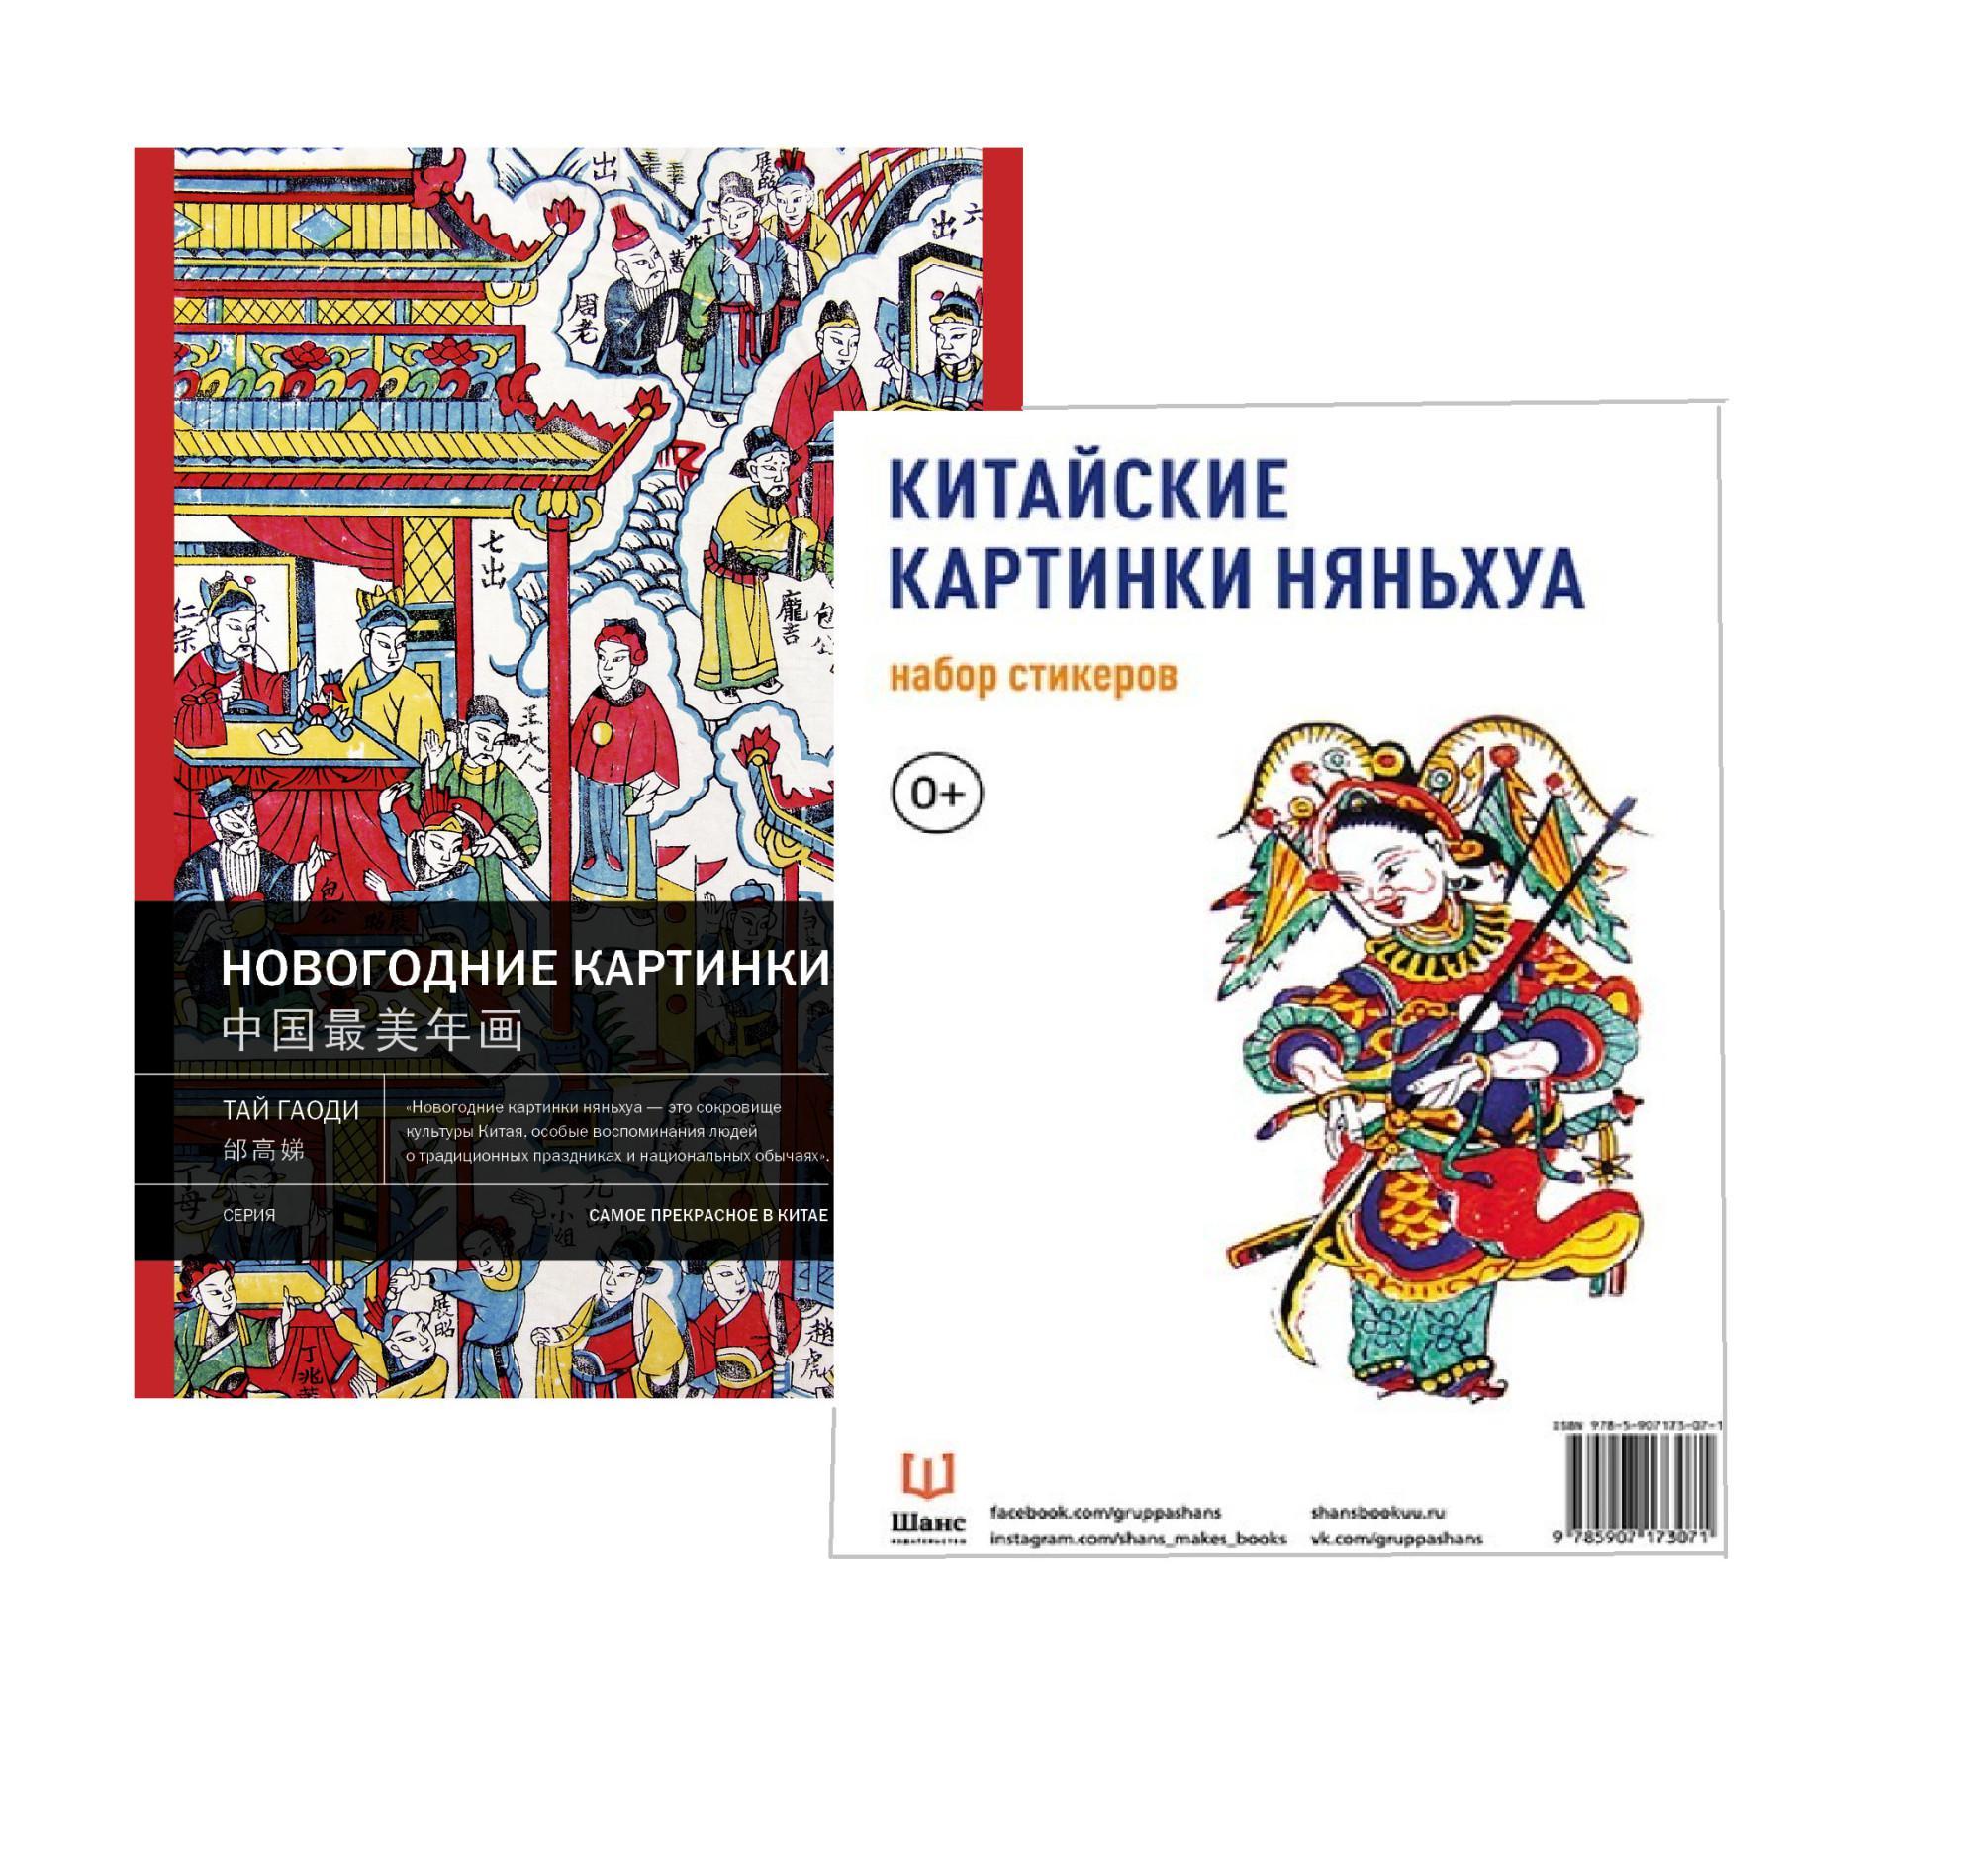 Книга Китайские картинки и набор стикерпаков Няньхуа